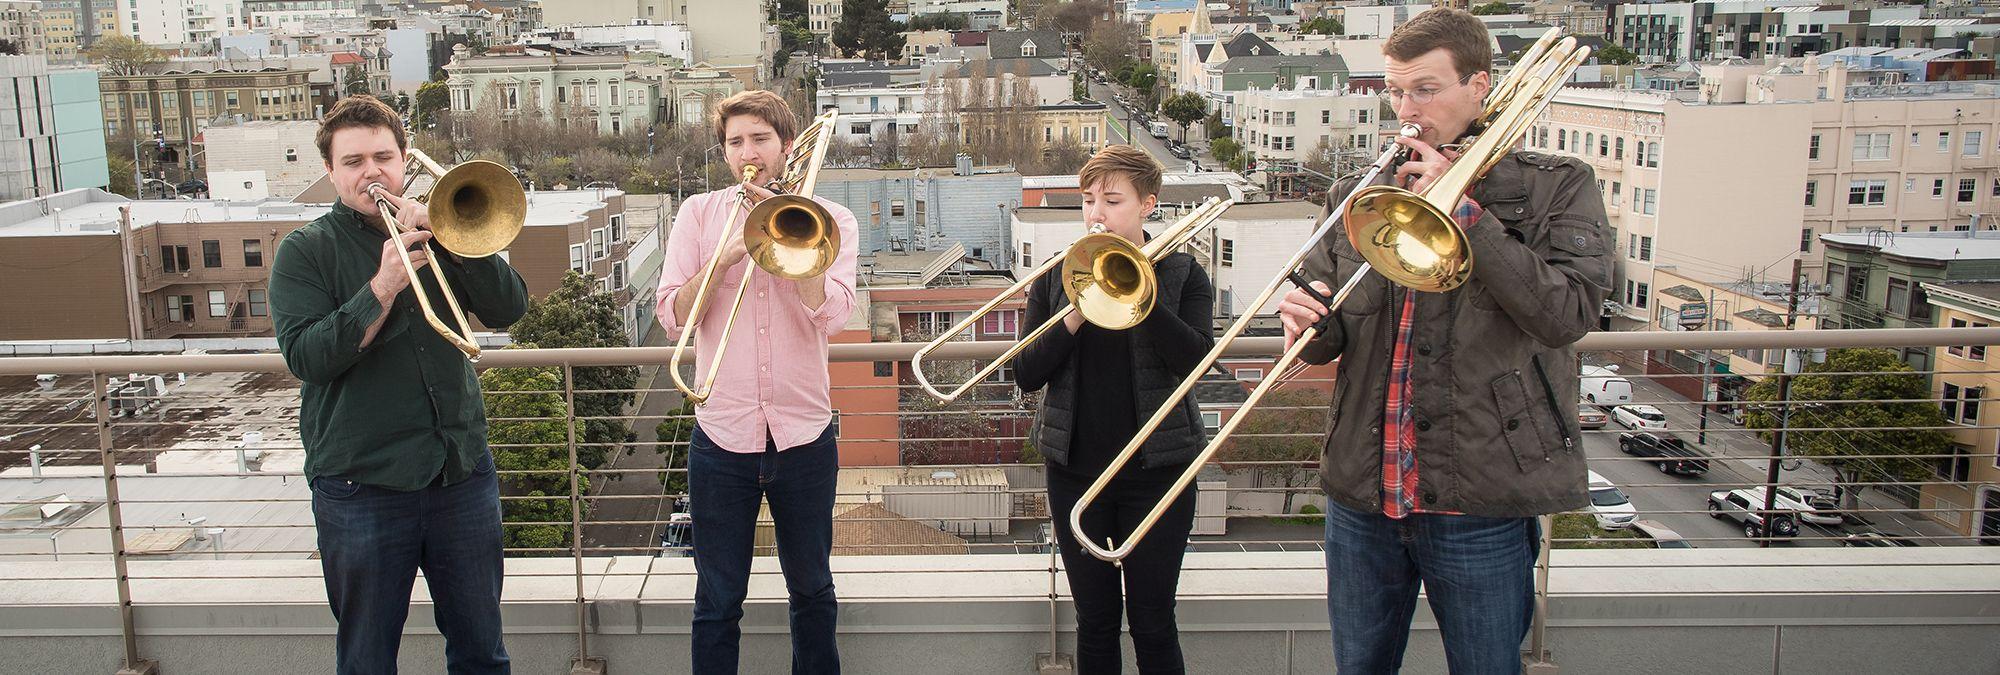 Trombone students performing